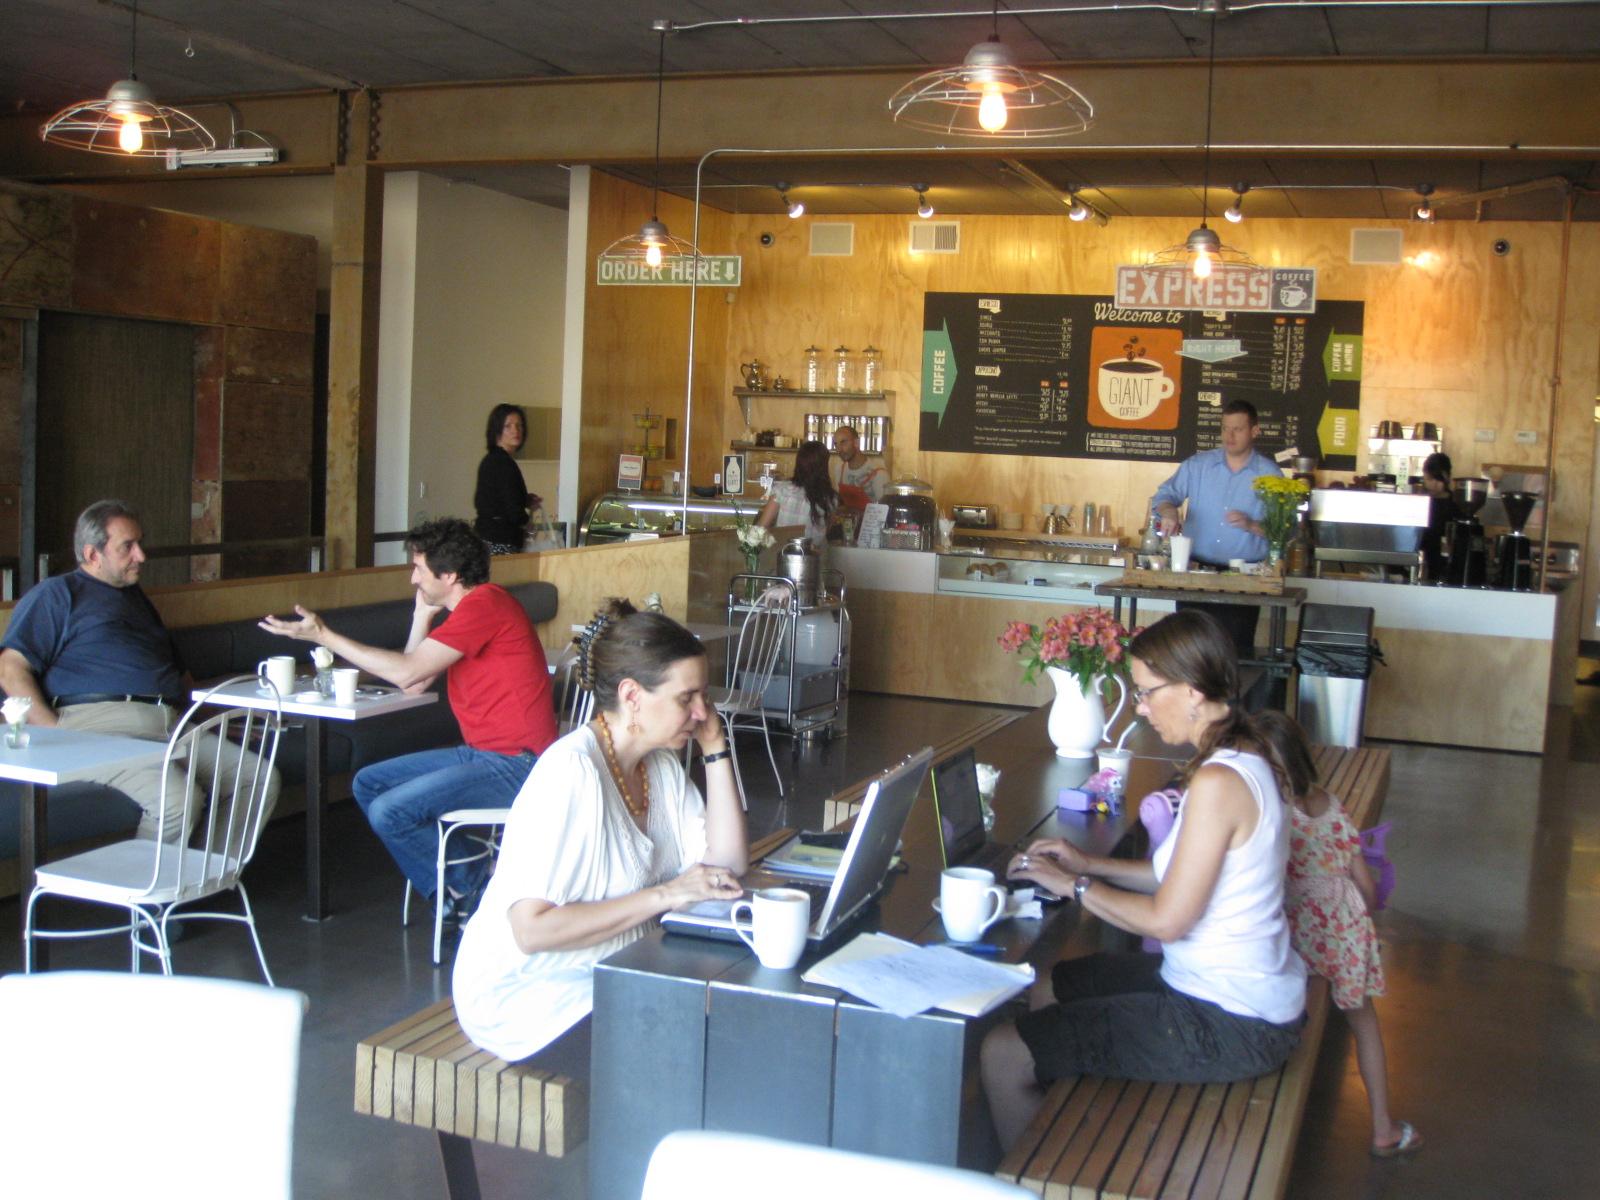 Inside Giant Coffee